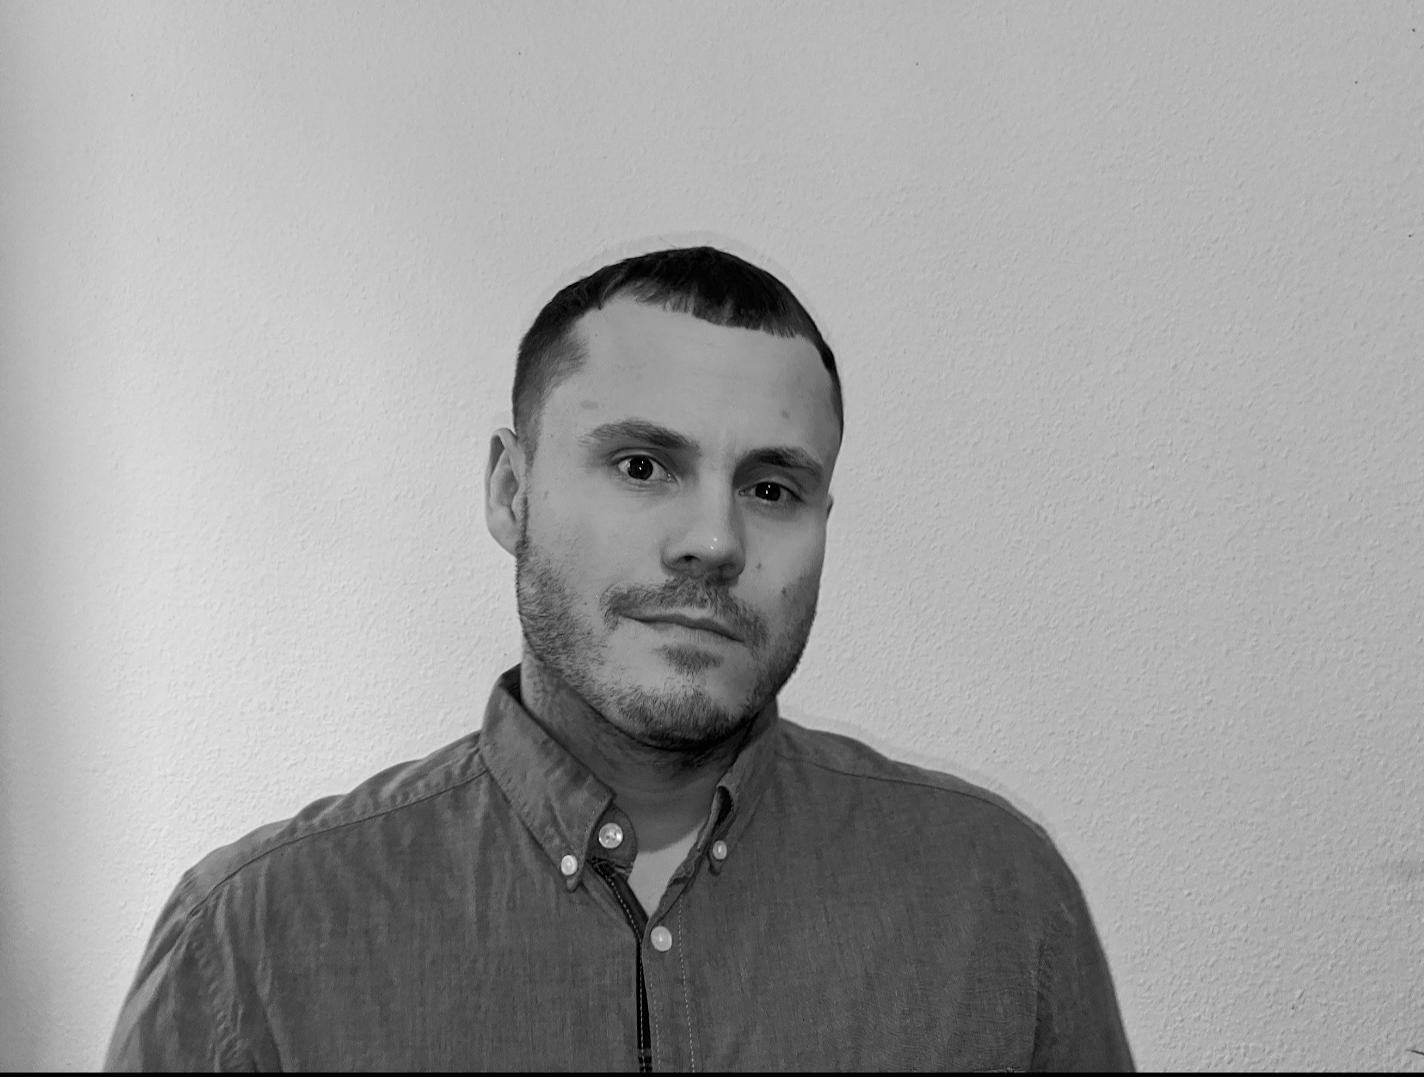 Portrait von Petr Horych